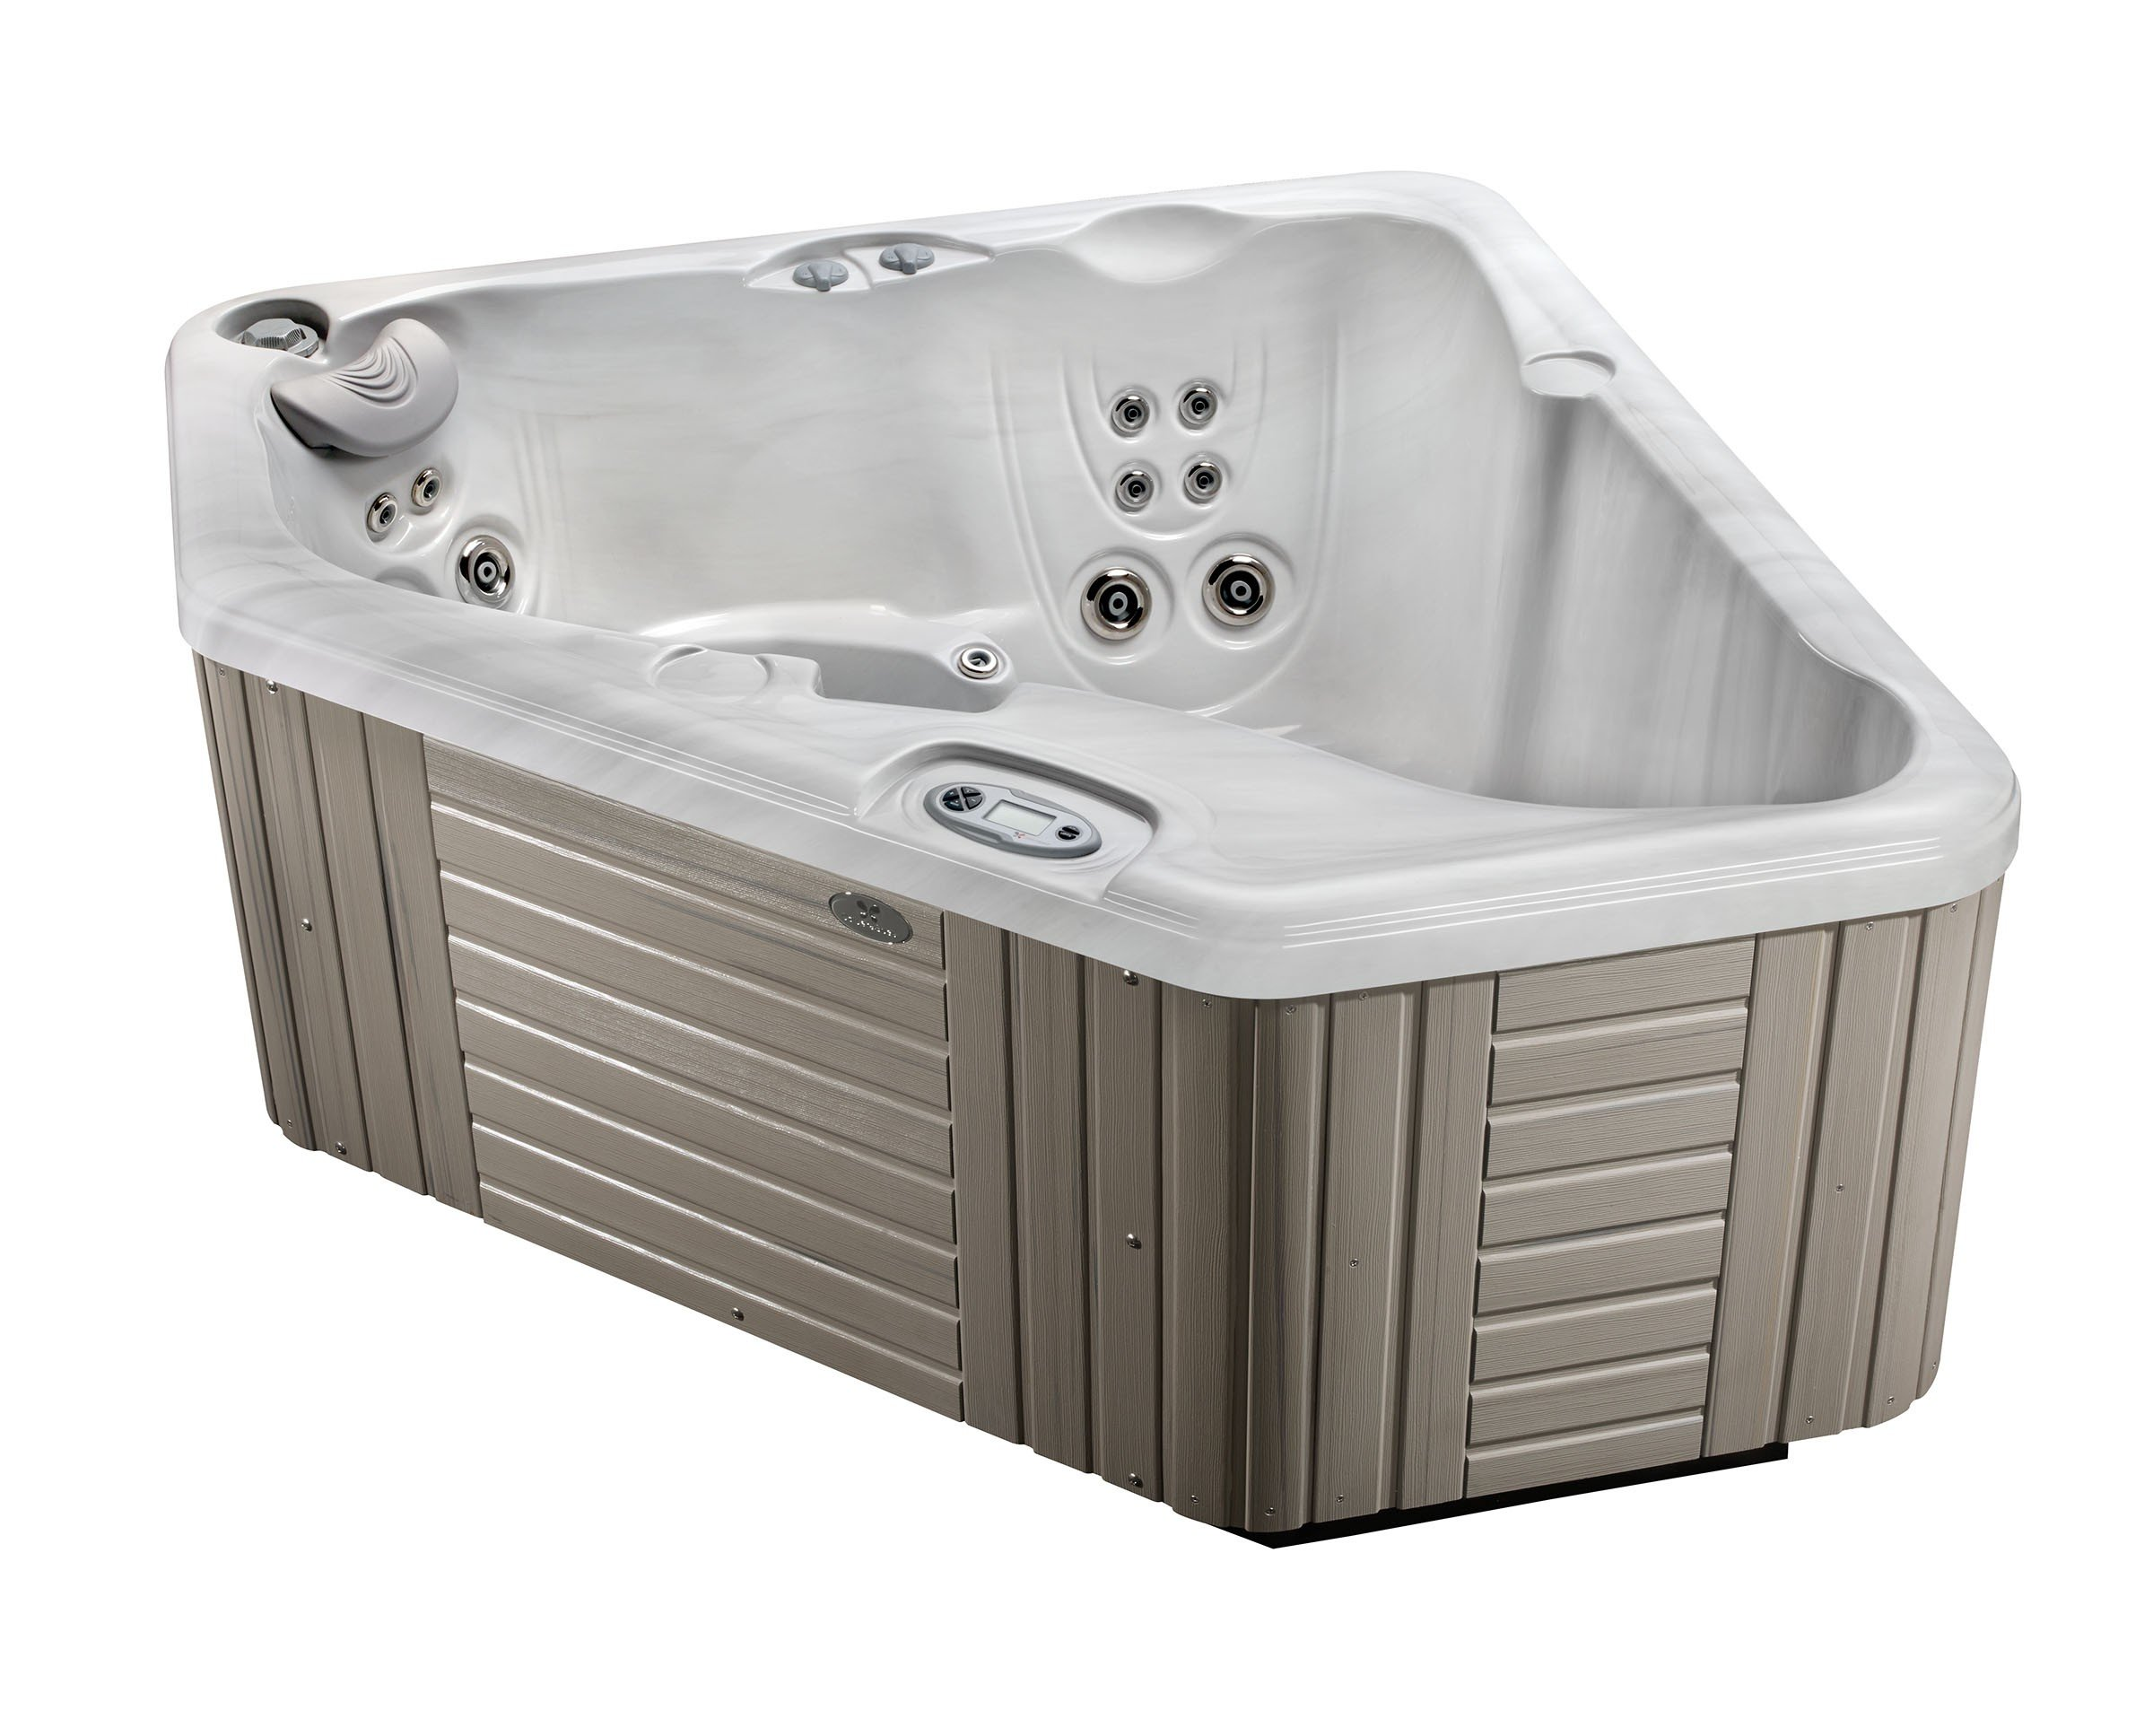 freestanding x virtu soaking serenity jacuzzi person usa vtu tub